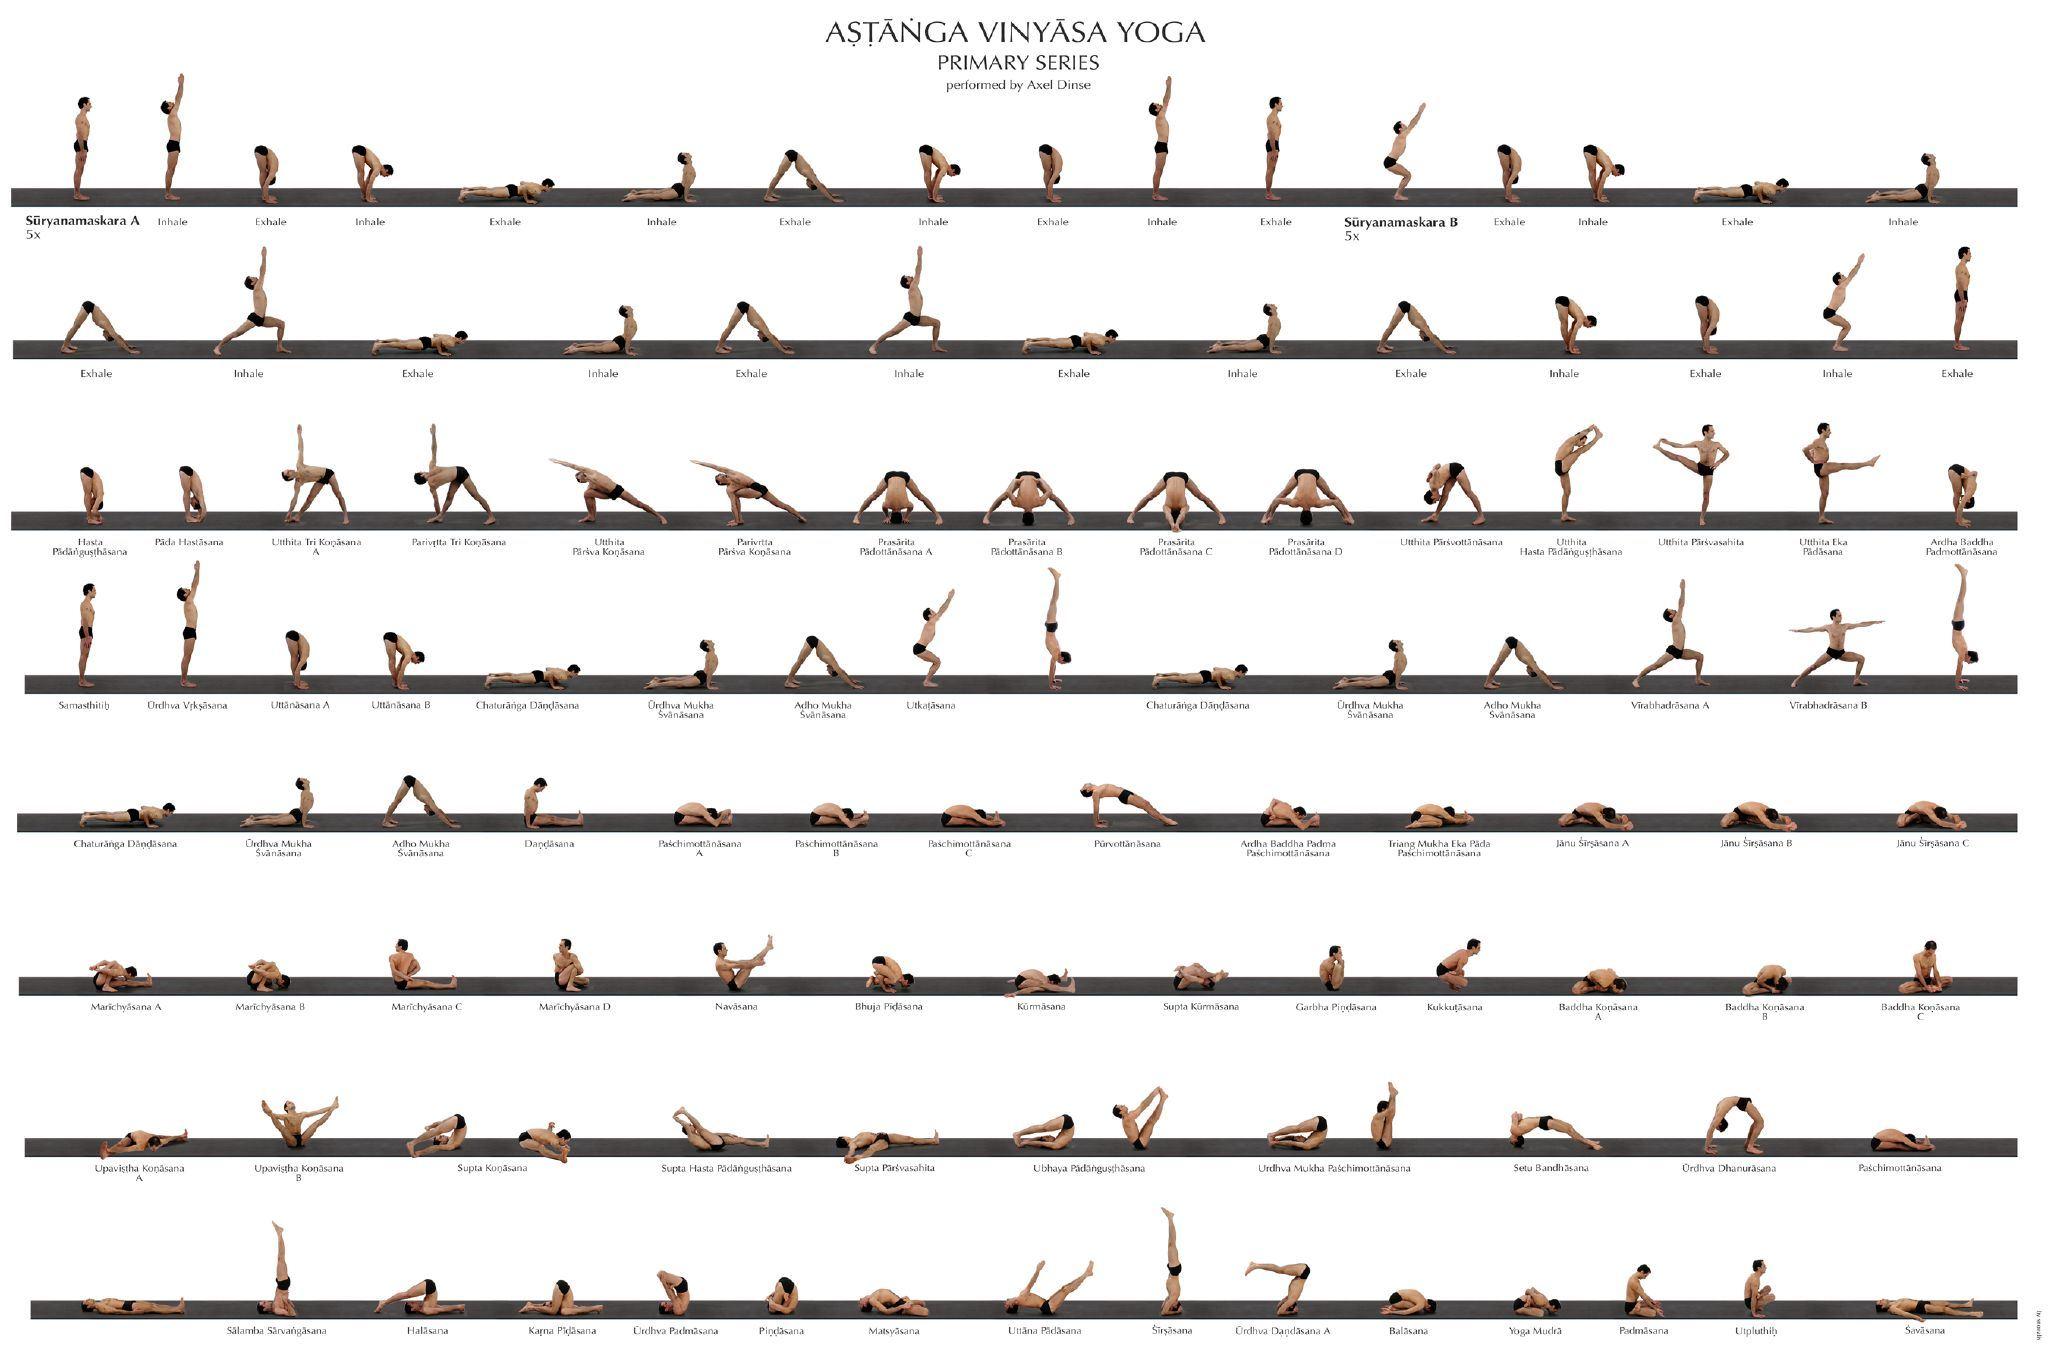 Ashtanga Primary Series Sequence